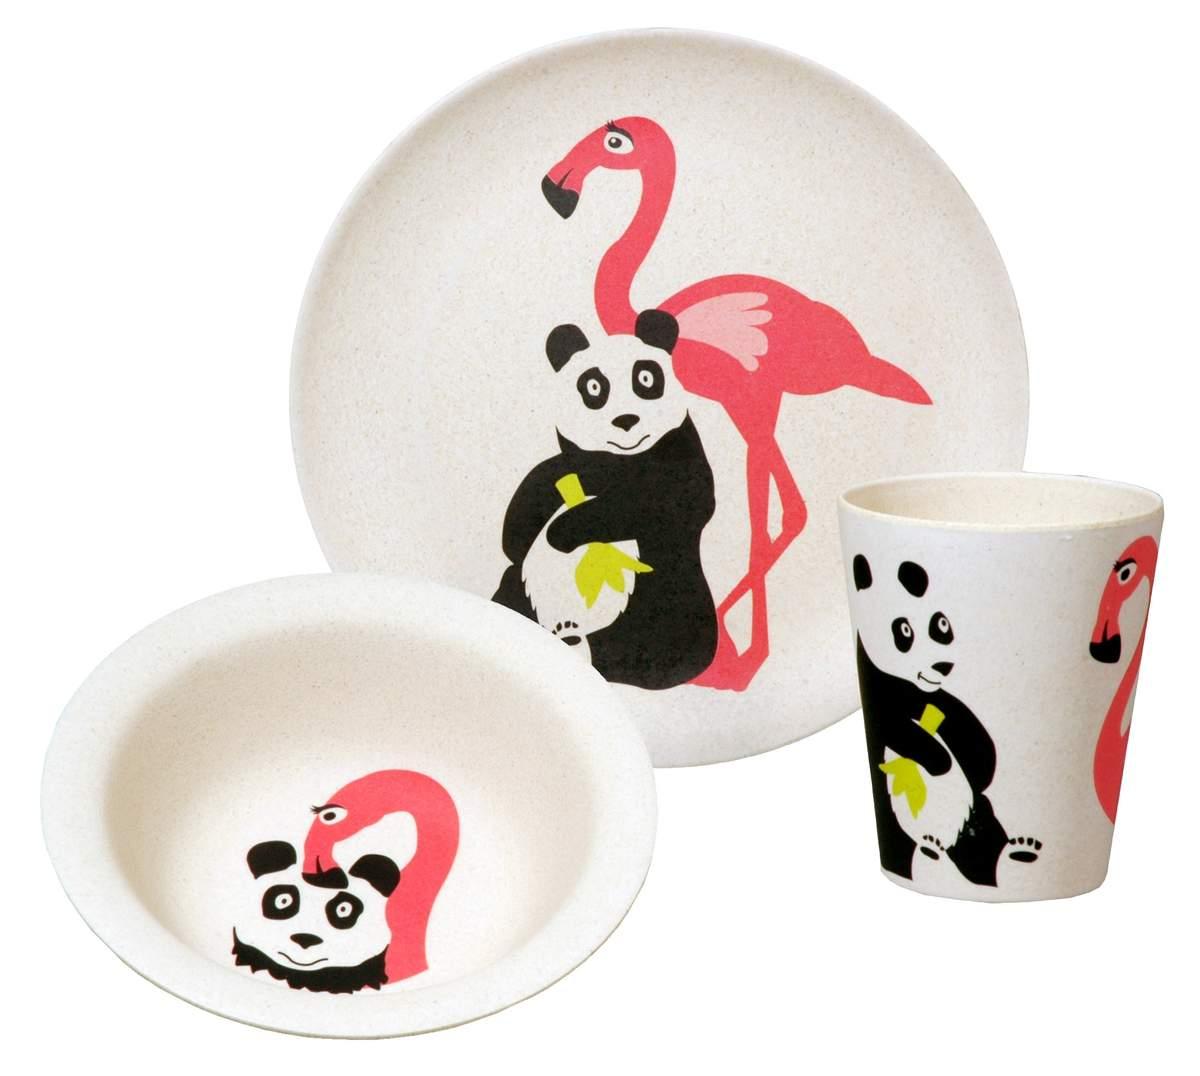 Artikelbild: Geschirrset Panda mit Flamingo, Zuperzozial